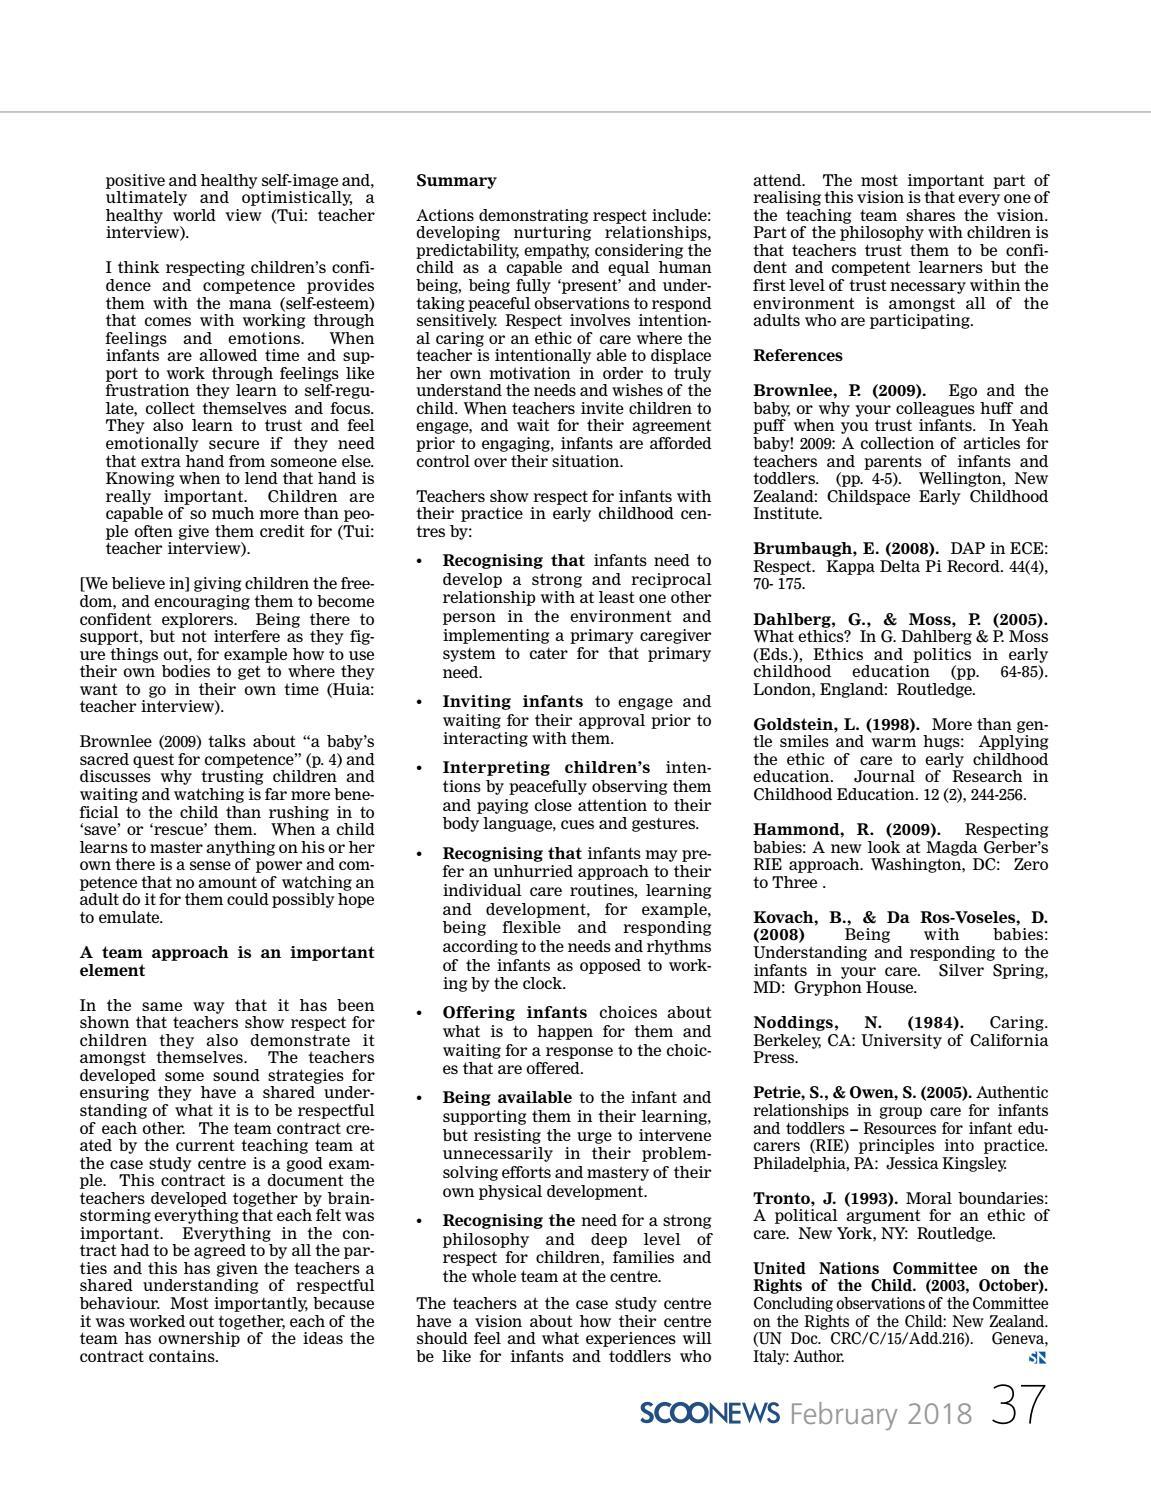 Scoonews February 2018 Digital Edition By Scoonews Issuu